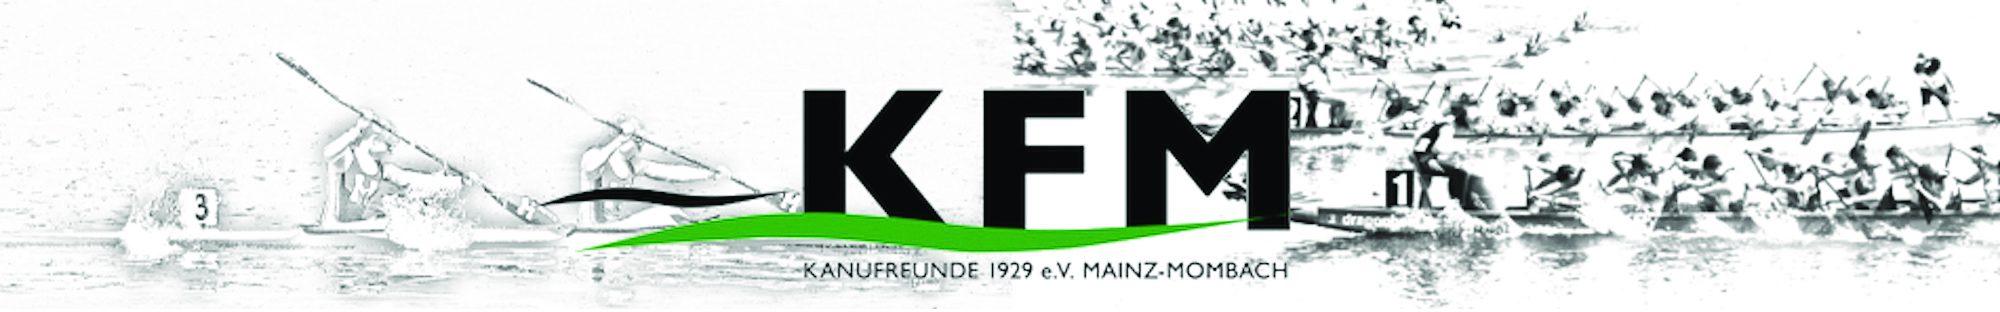 Kanufreunde 1929 e. V. Mainz-Mombach